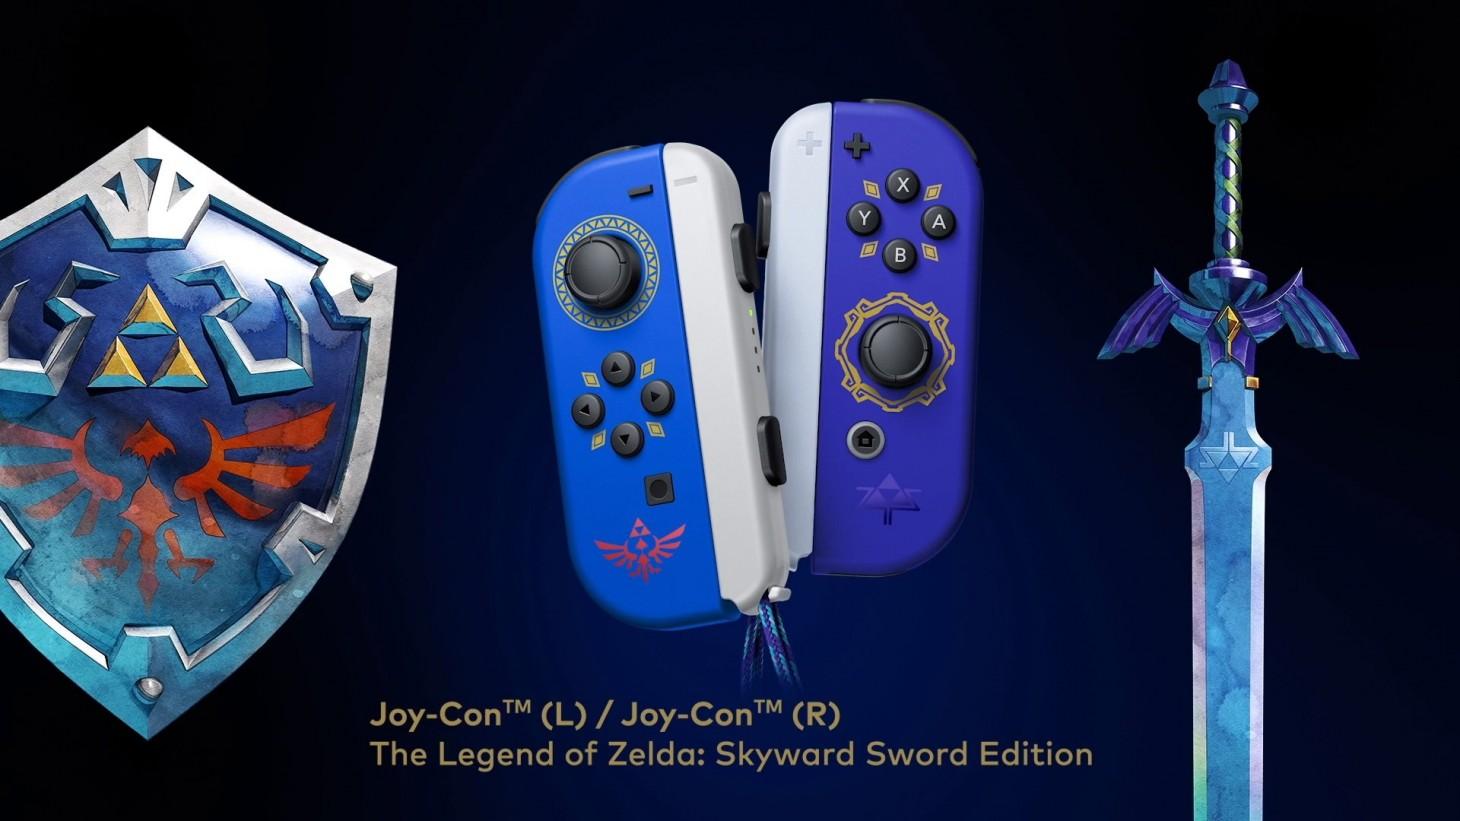 Special Edition Legend Of Zelda: Skyward Sword Joy-Cons Revealed For Nintendo  Switch - Game Informer